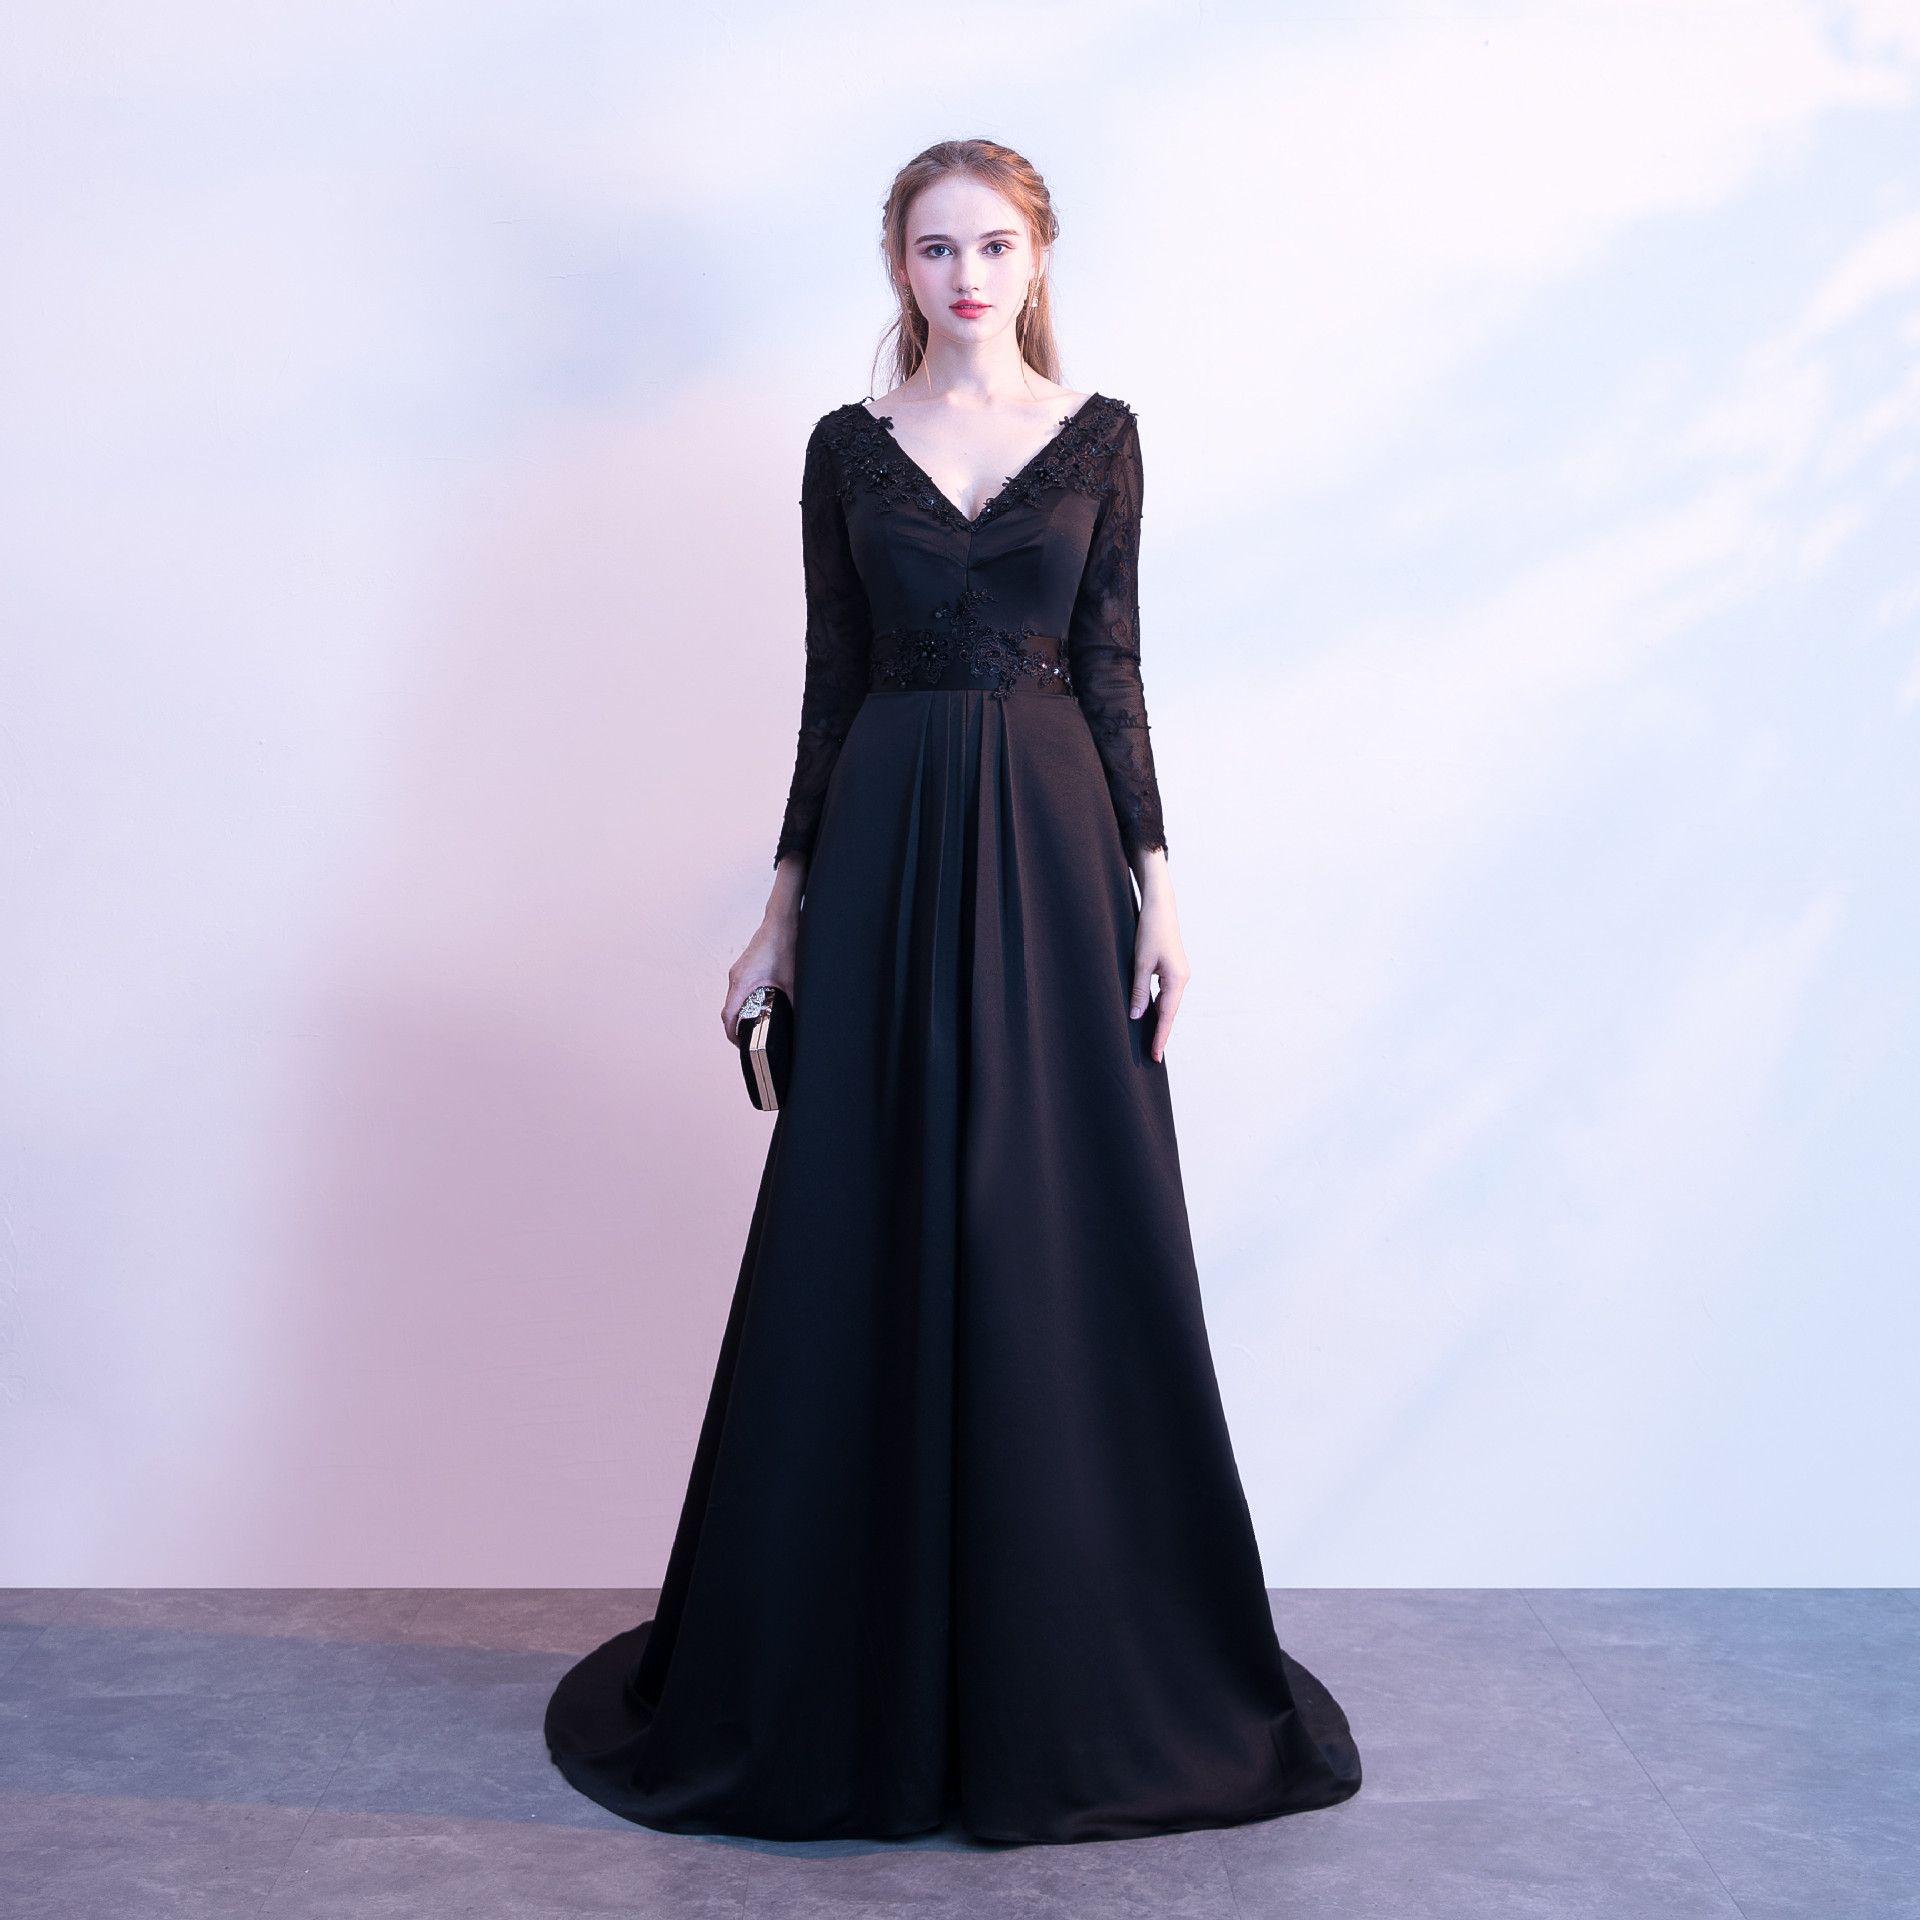 6a05cfad5ea Designer Formal Dresses Wholesale - Gomes Weine AG